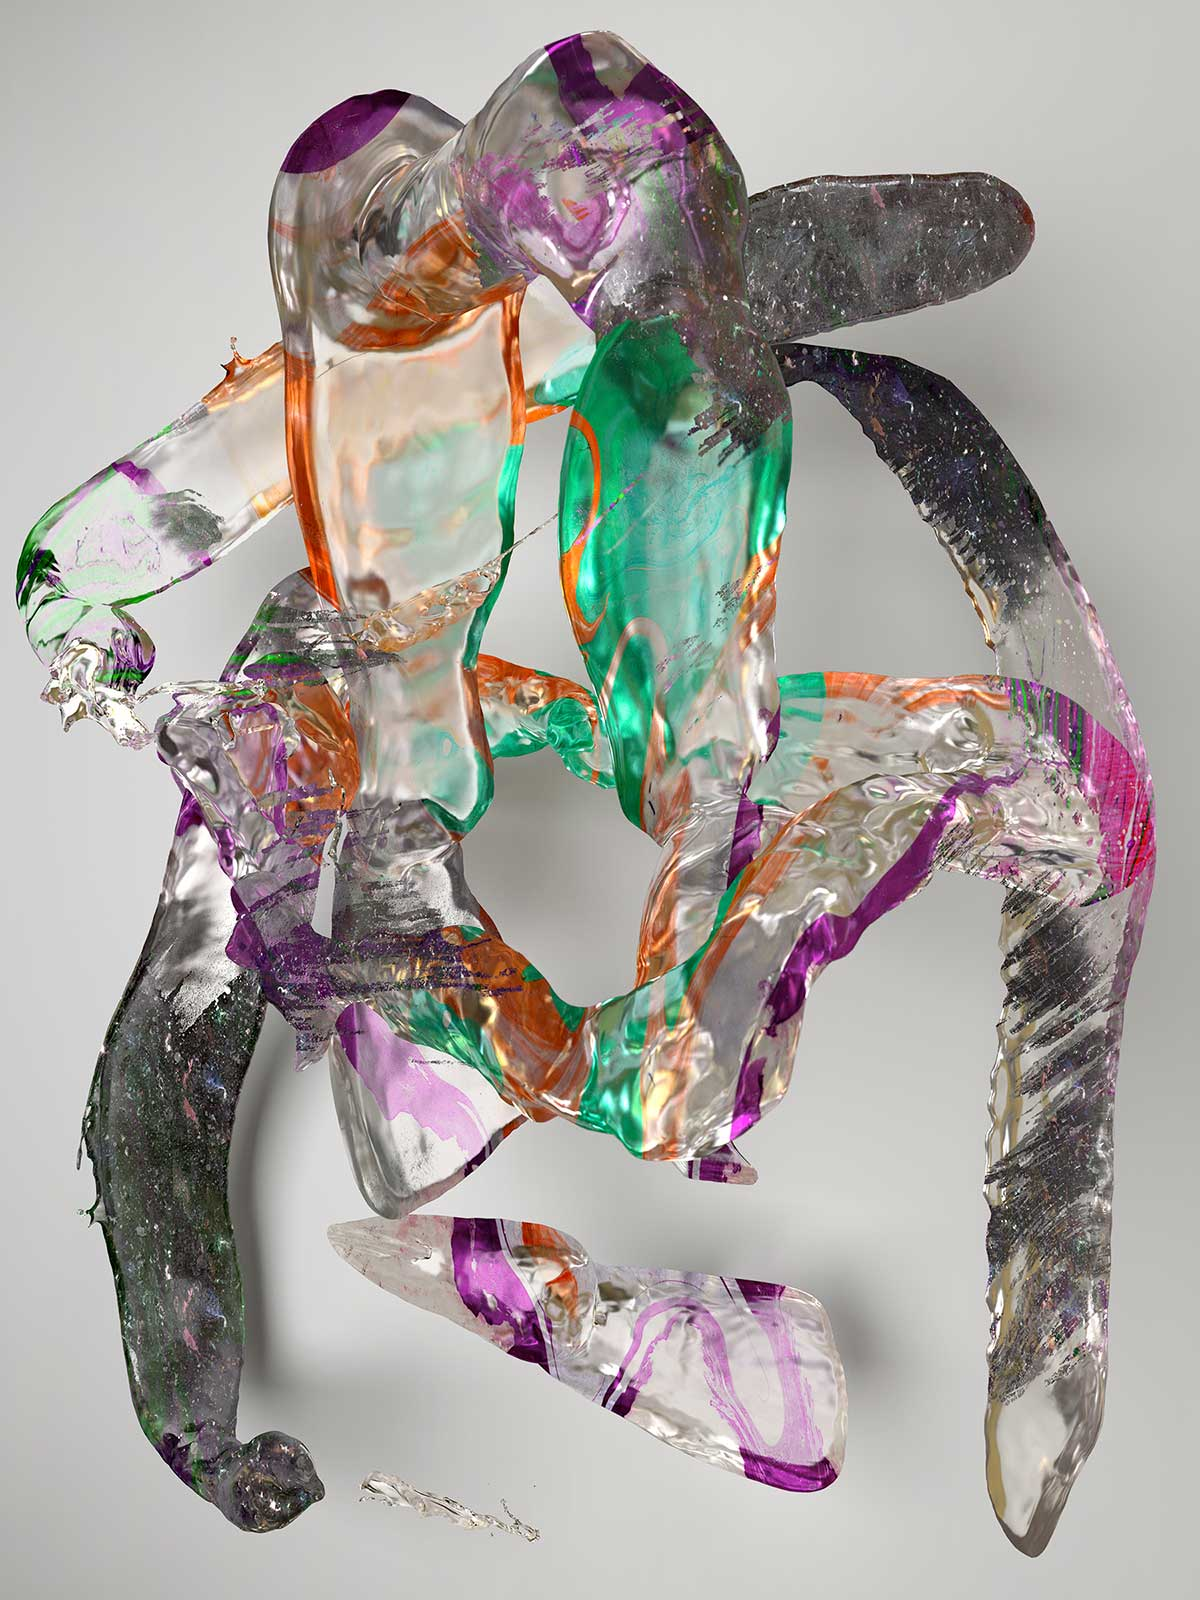 Substance I 09, CGI Fine Art Print, 140 x 105 cm, 2017